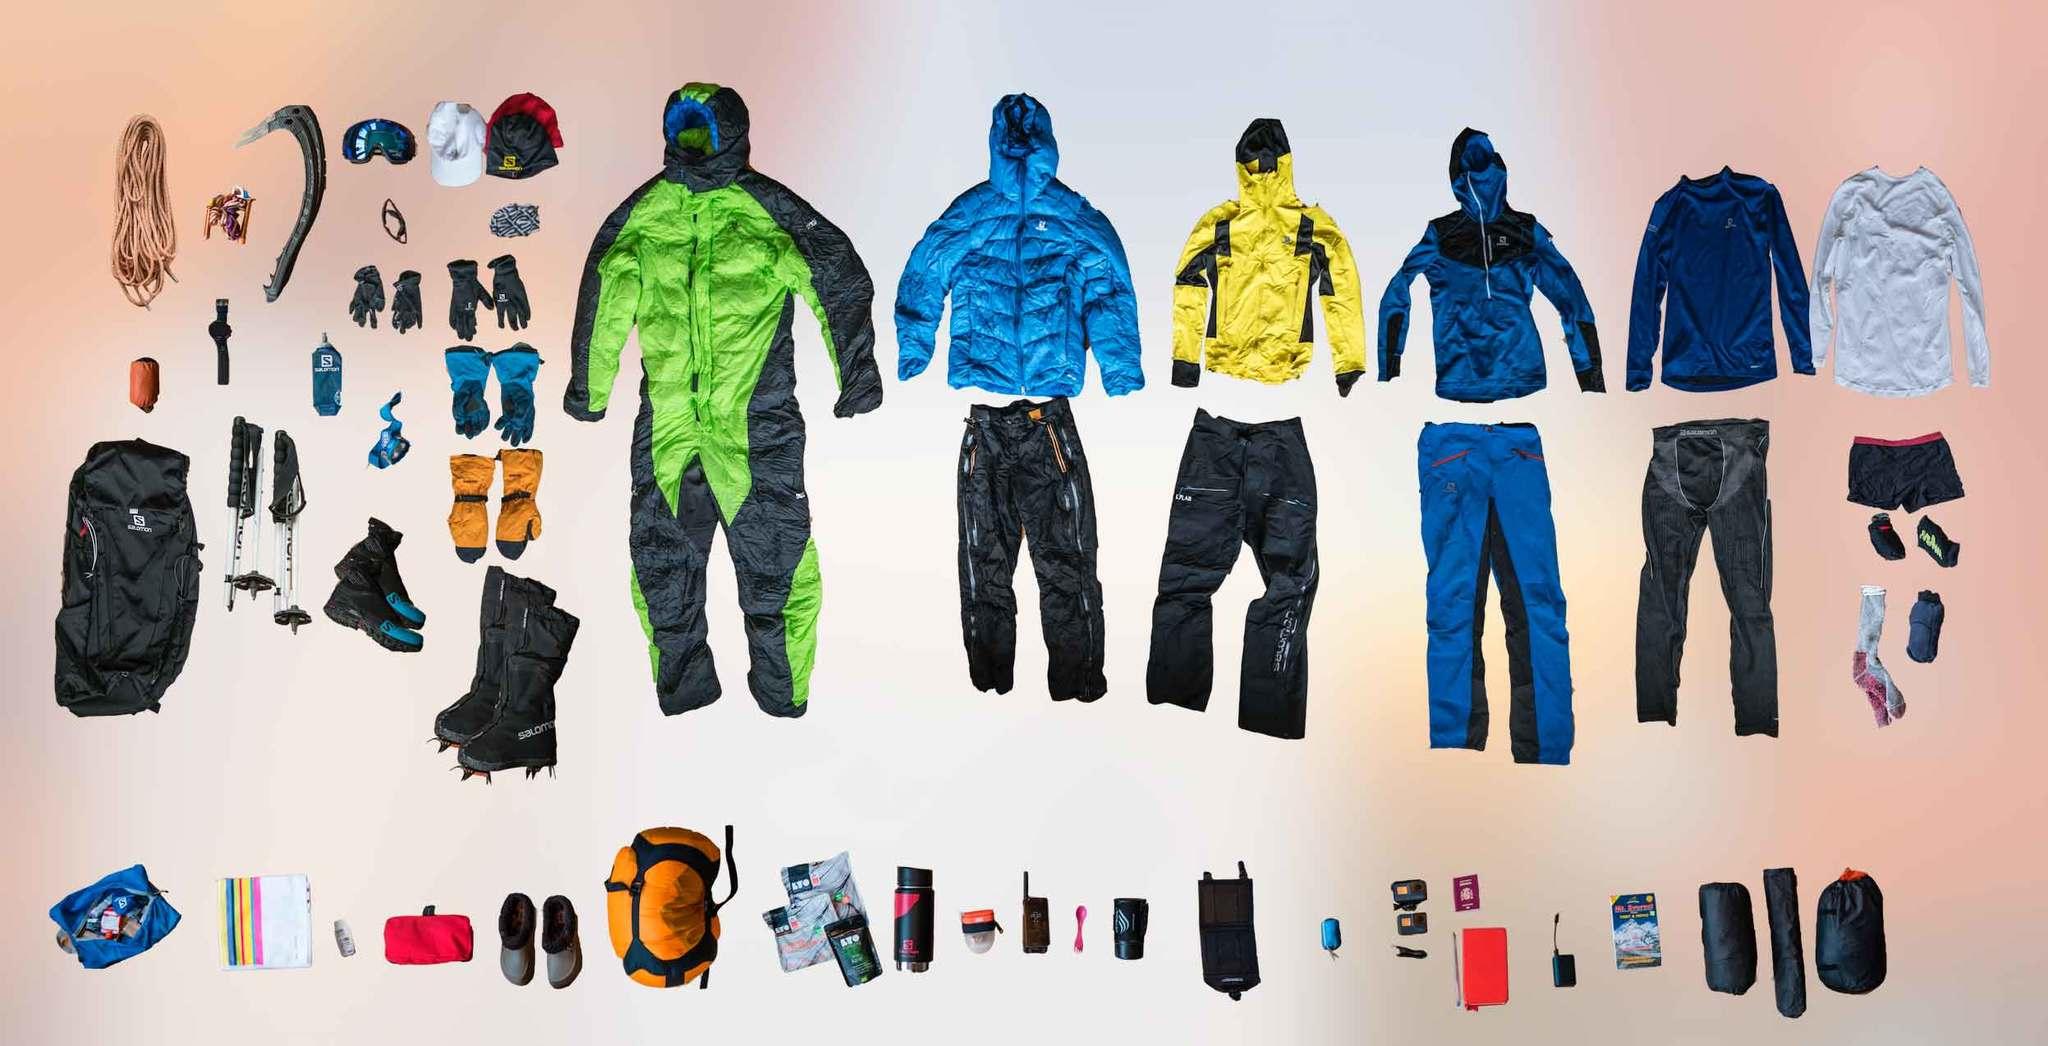 El equipo con el que Kilian Jornet afrontó el reto de Everest